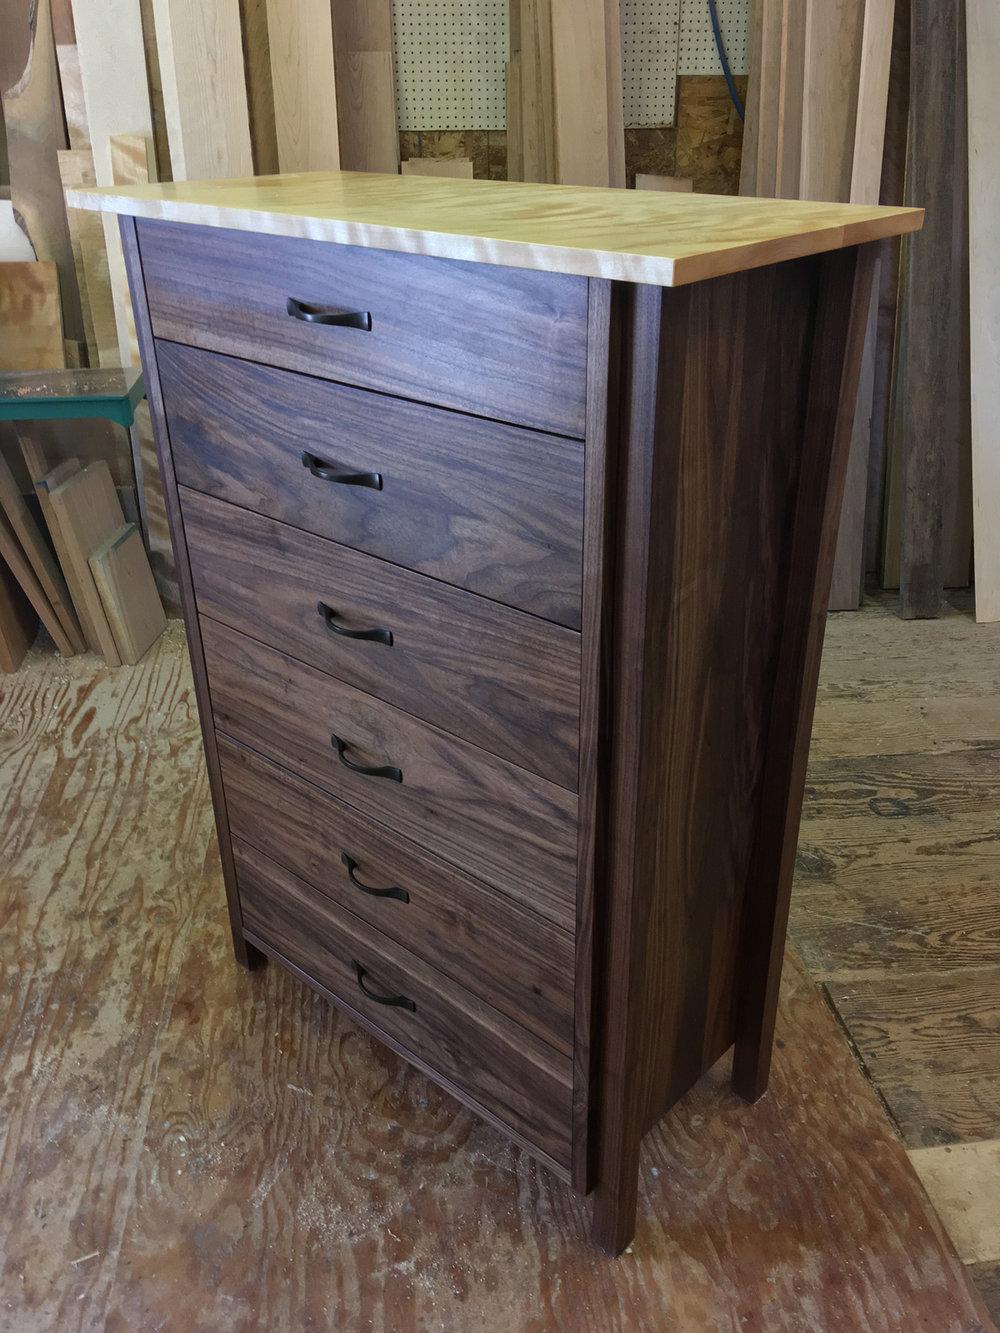 A flamed birch top on a 6 drawer walnut dresser.